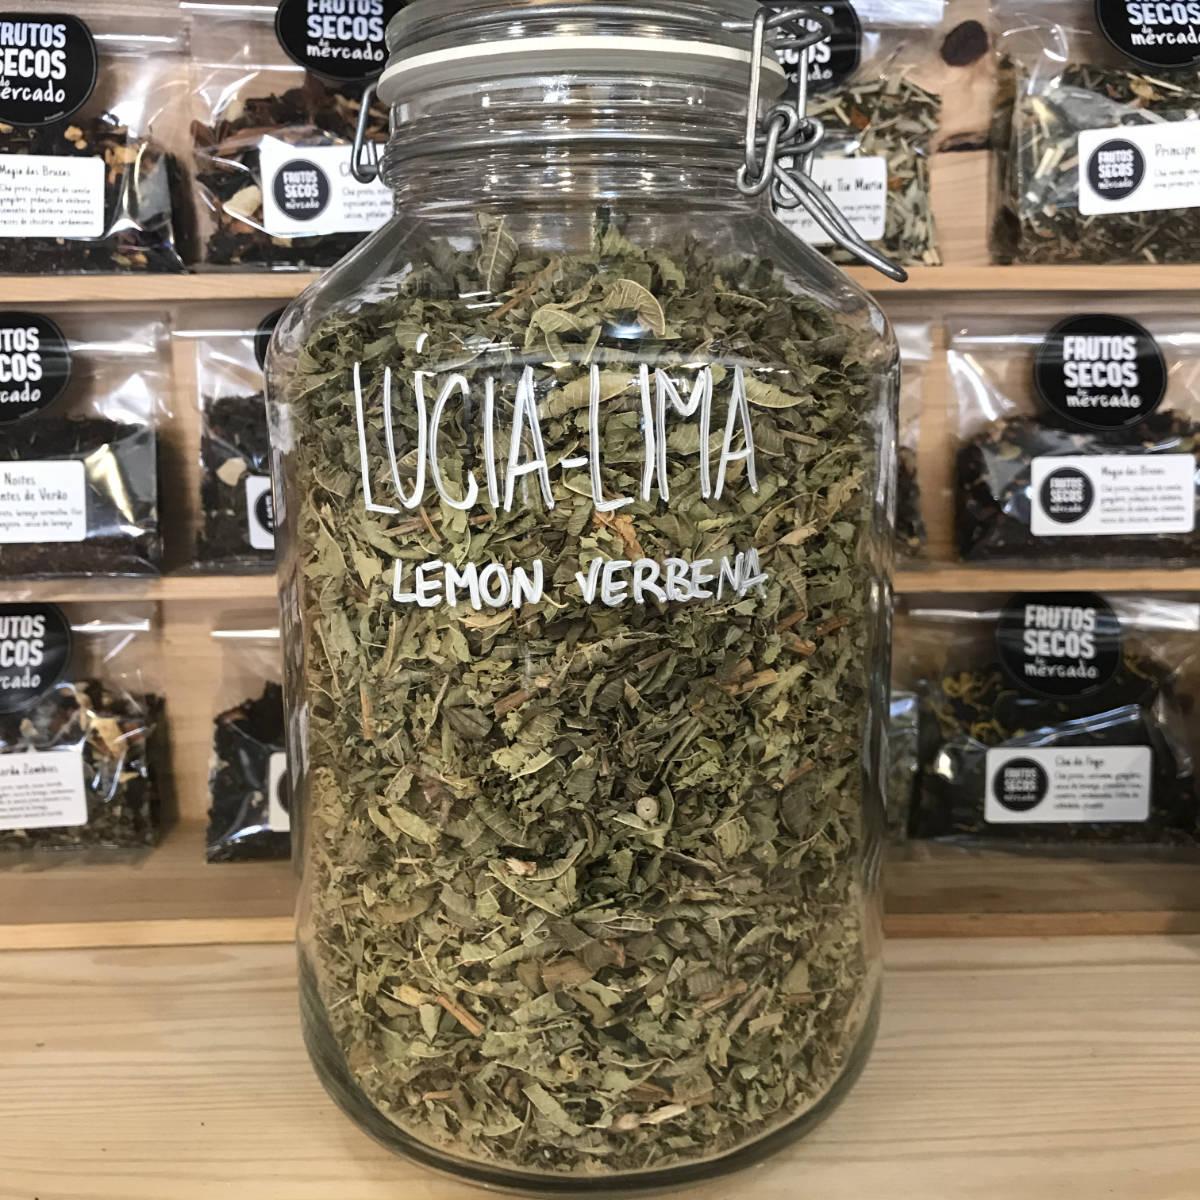 Lúcia-lima